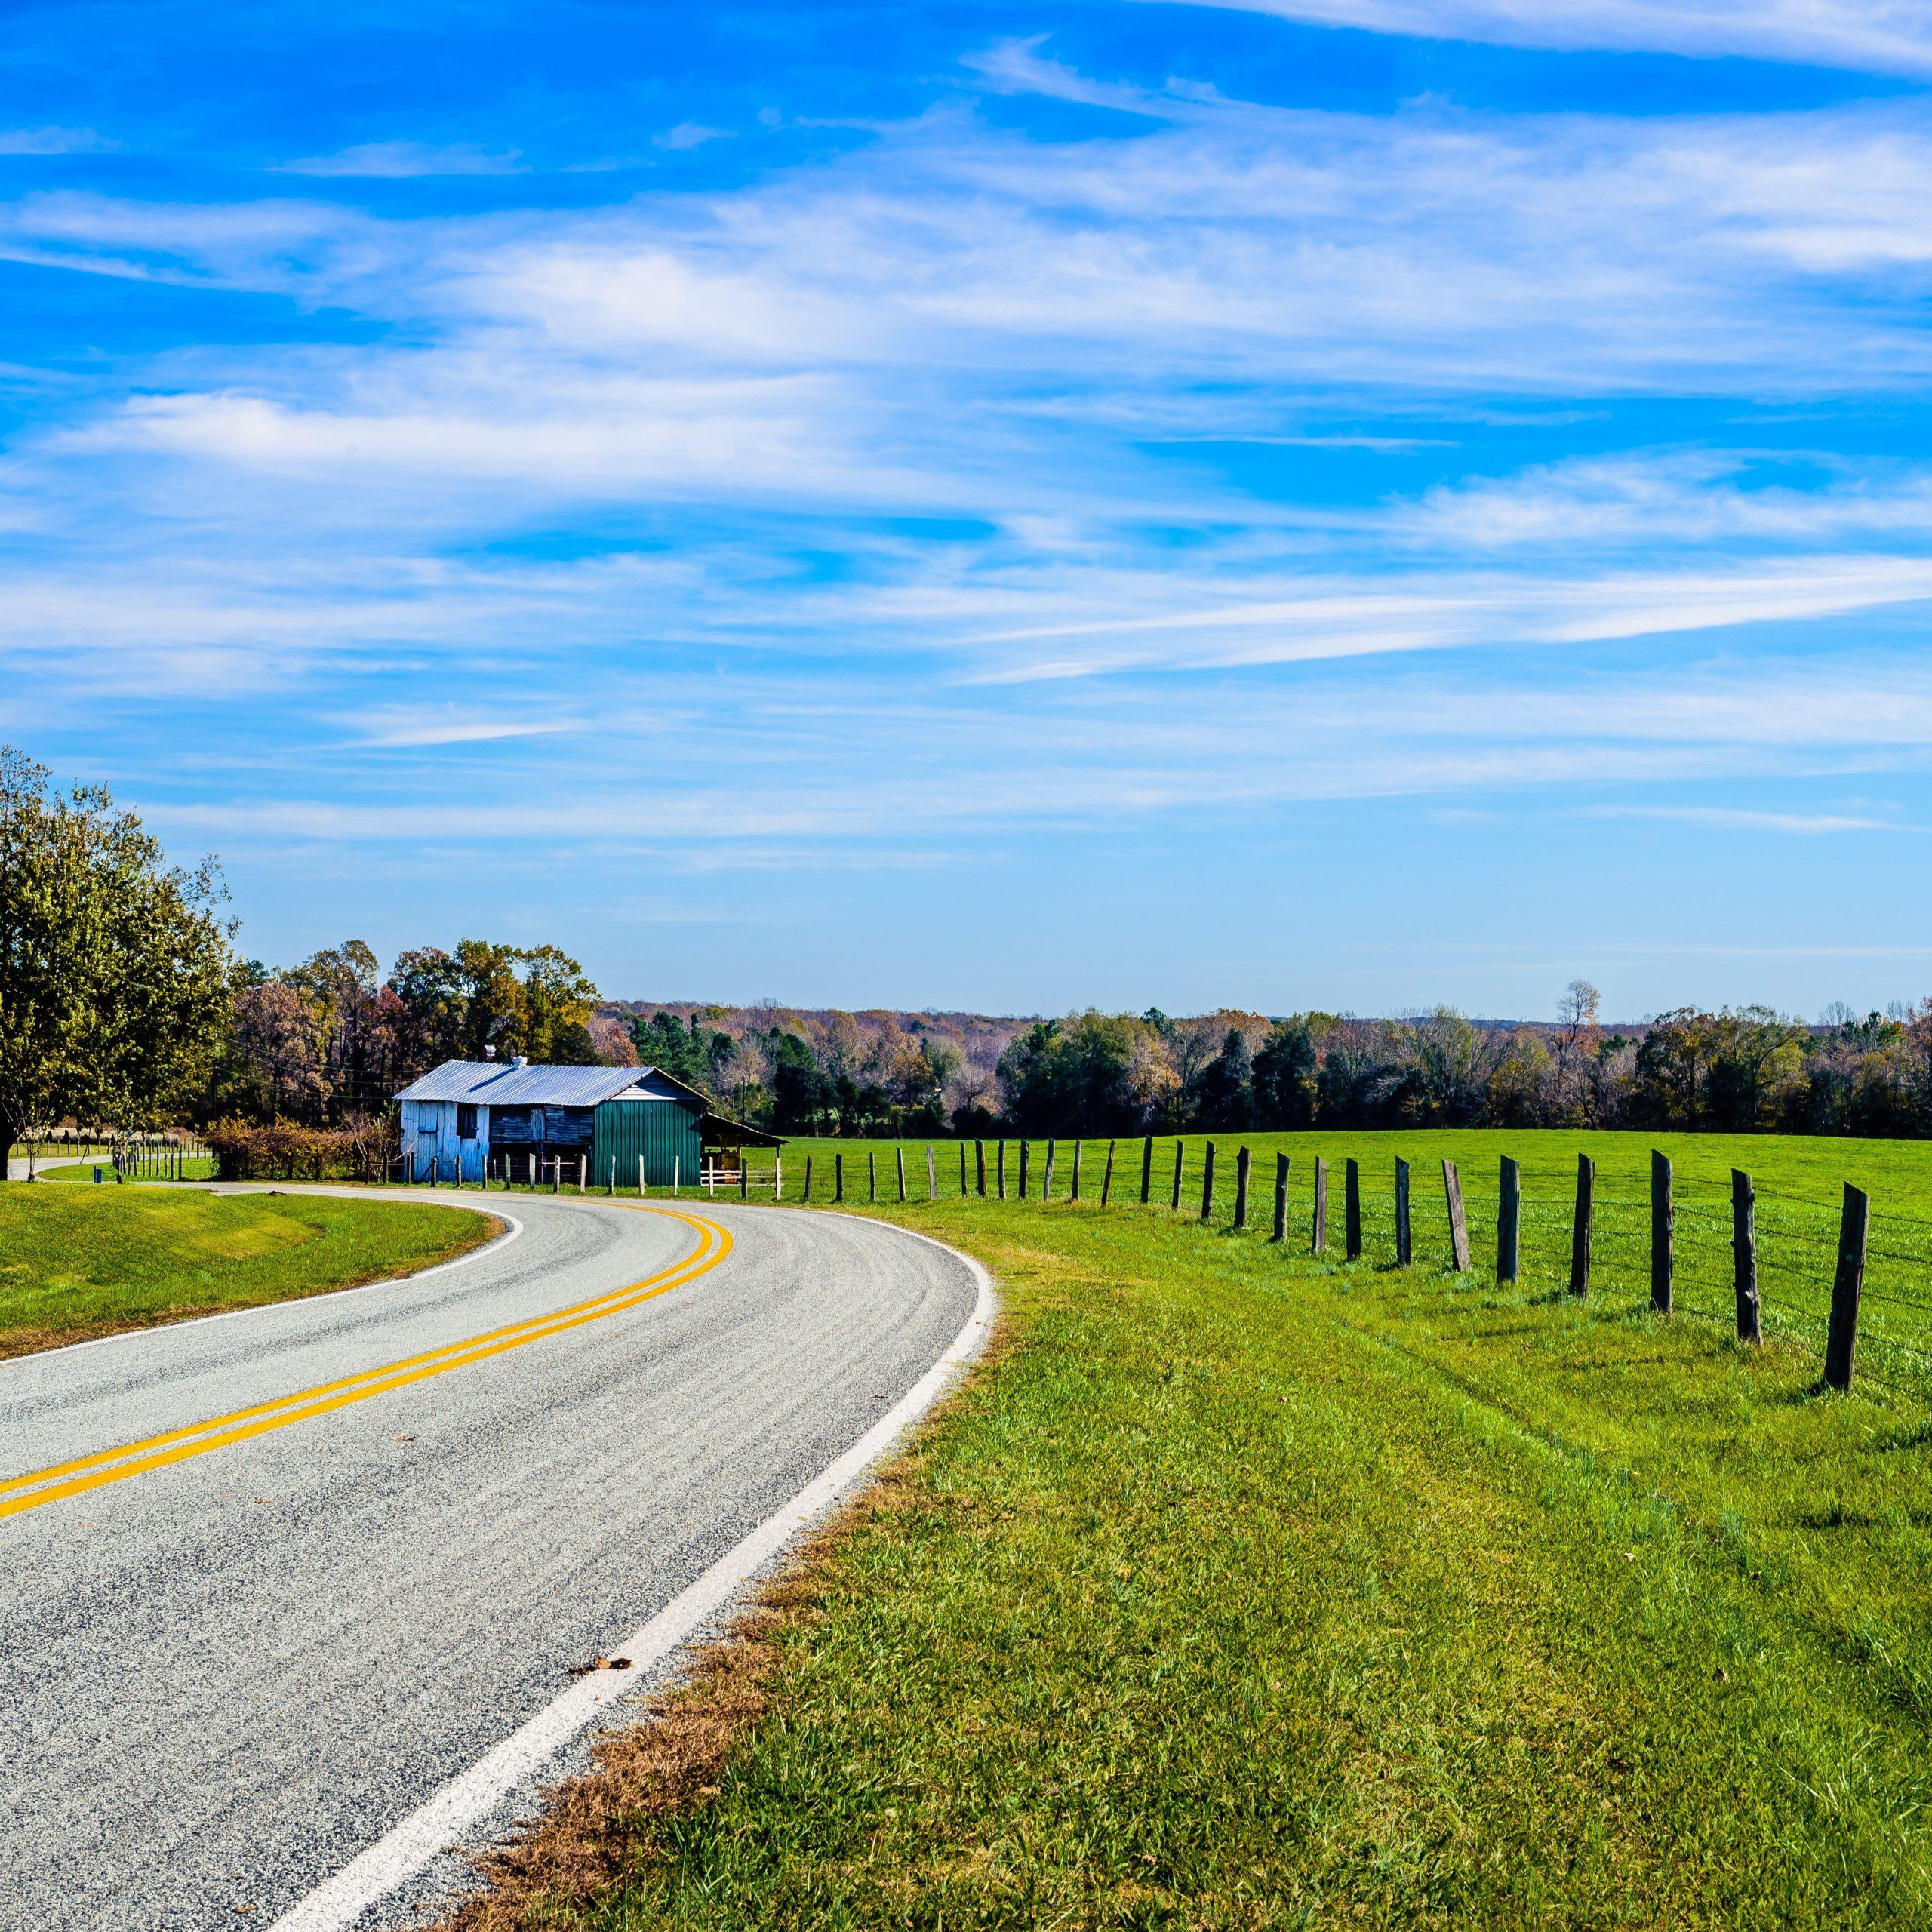 Rural highway in North Carolina